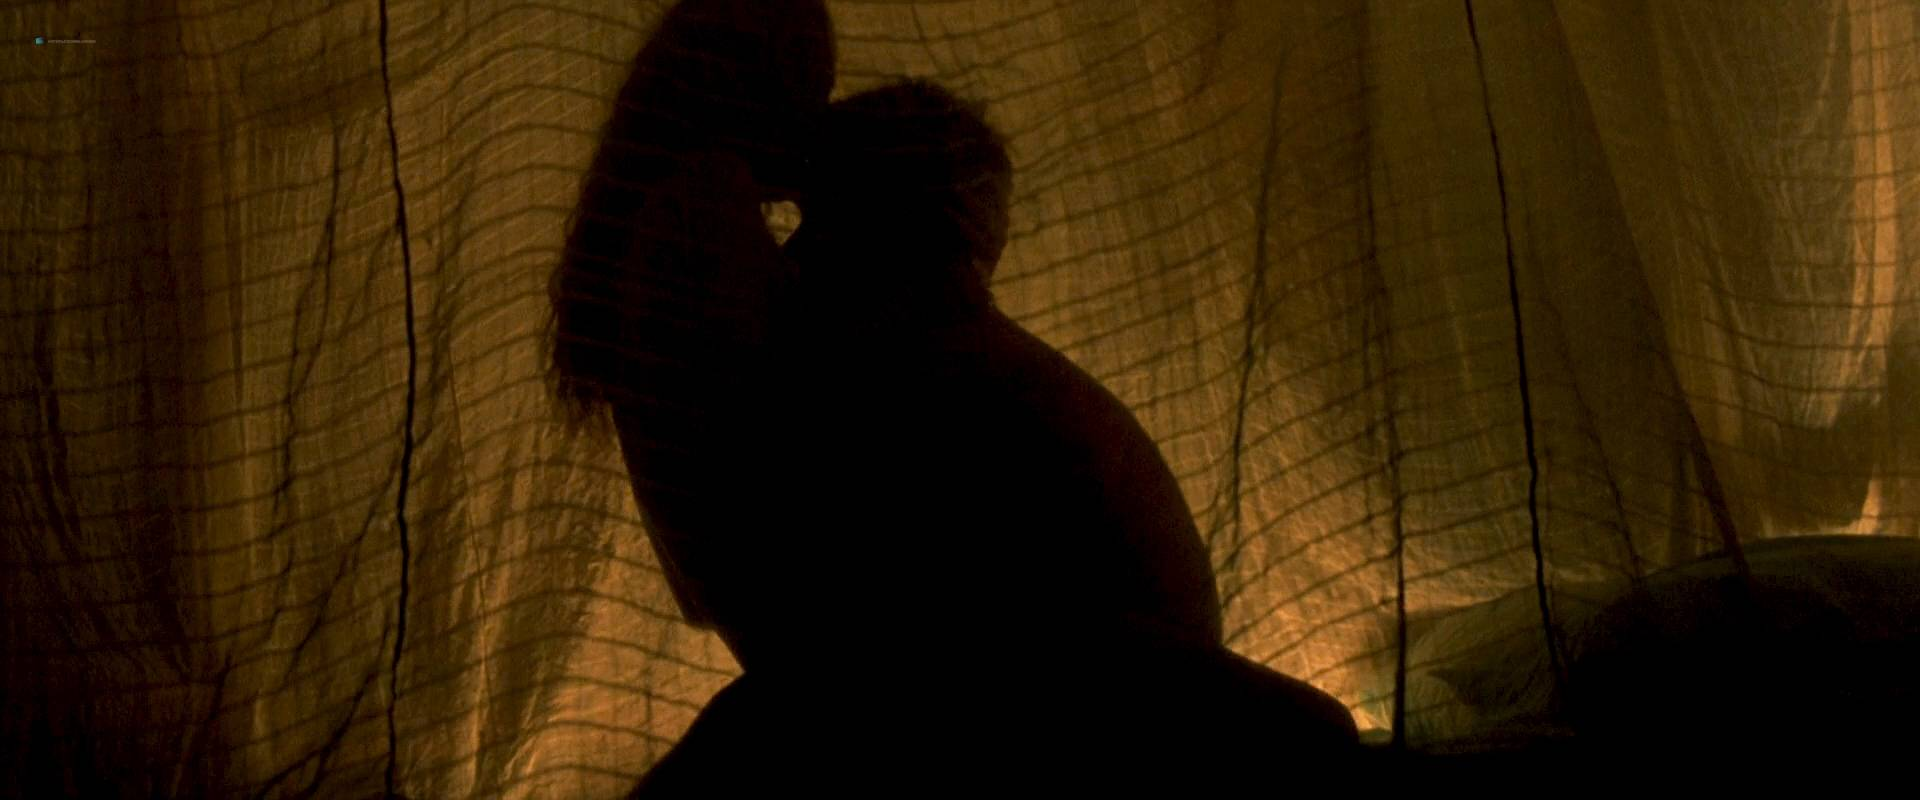 Virginie Ledoyen nude topless Tilda Swinton hot sex - The Beach (2000) HD 1080p BluRay (5)